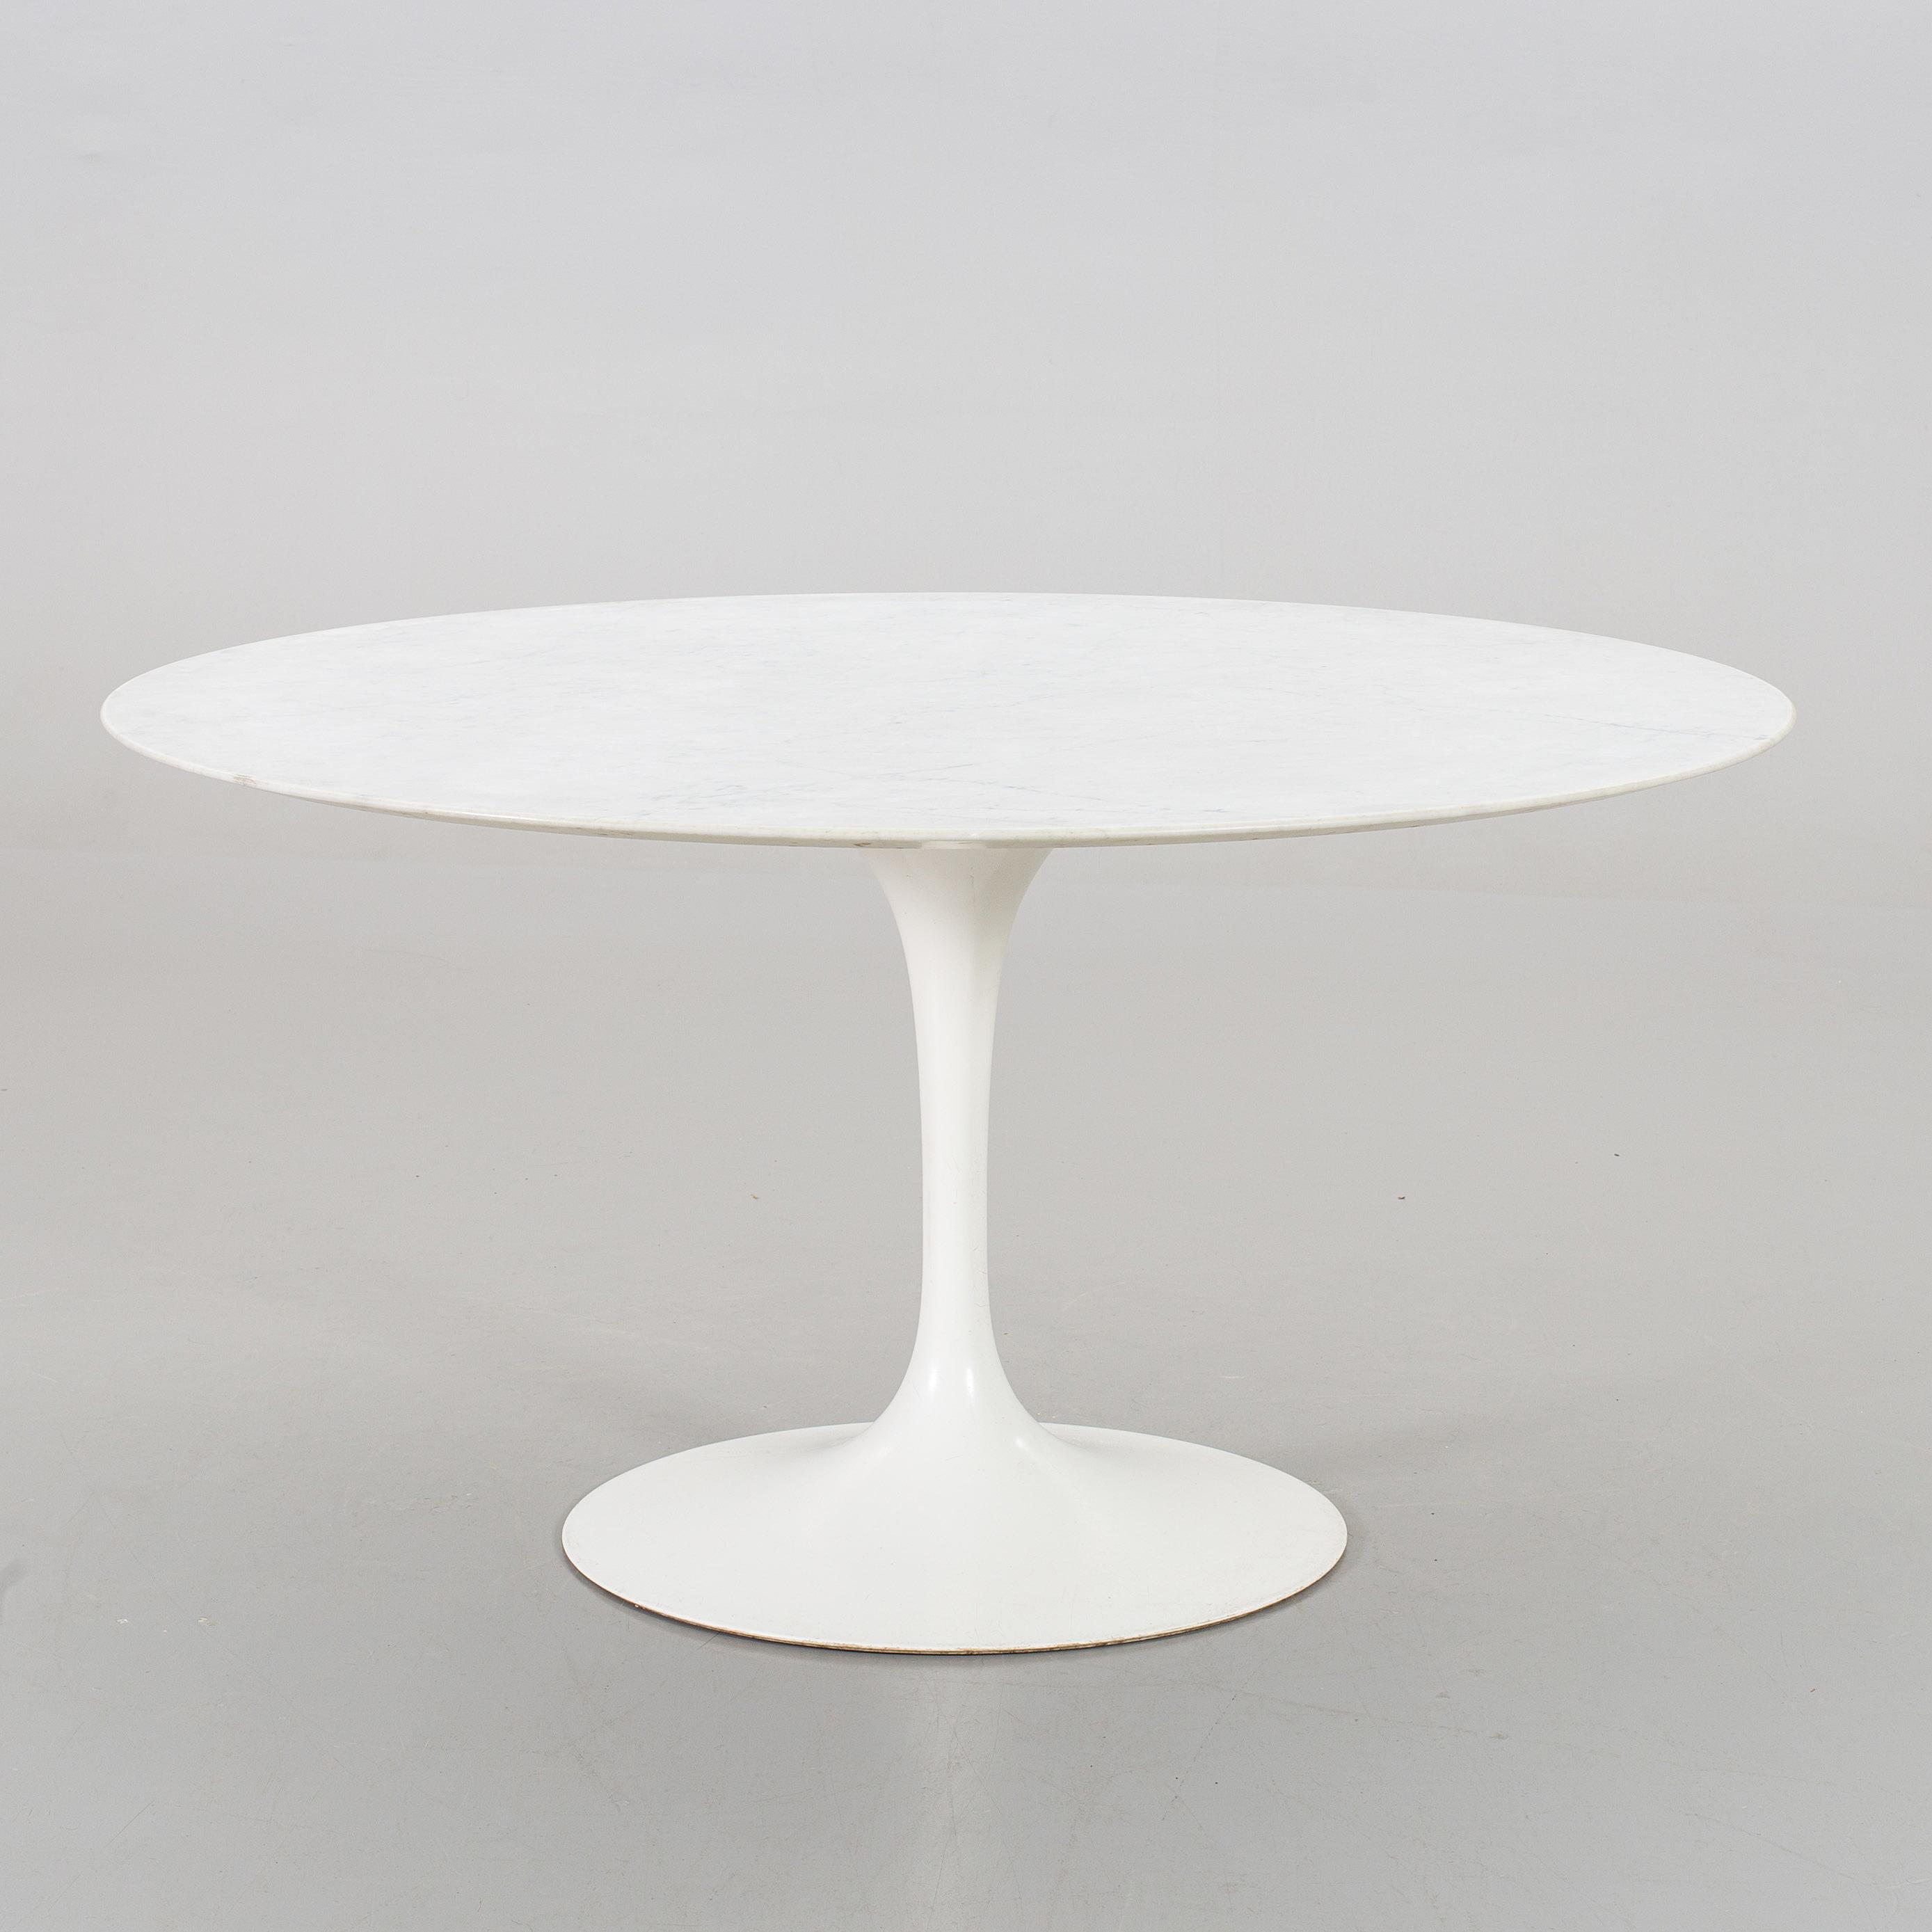 knoll utility buy the uk round design dining saarinen table tulip outdoor